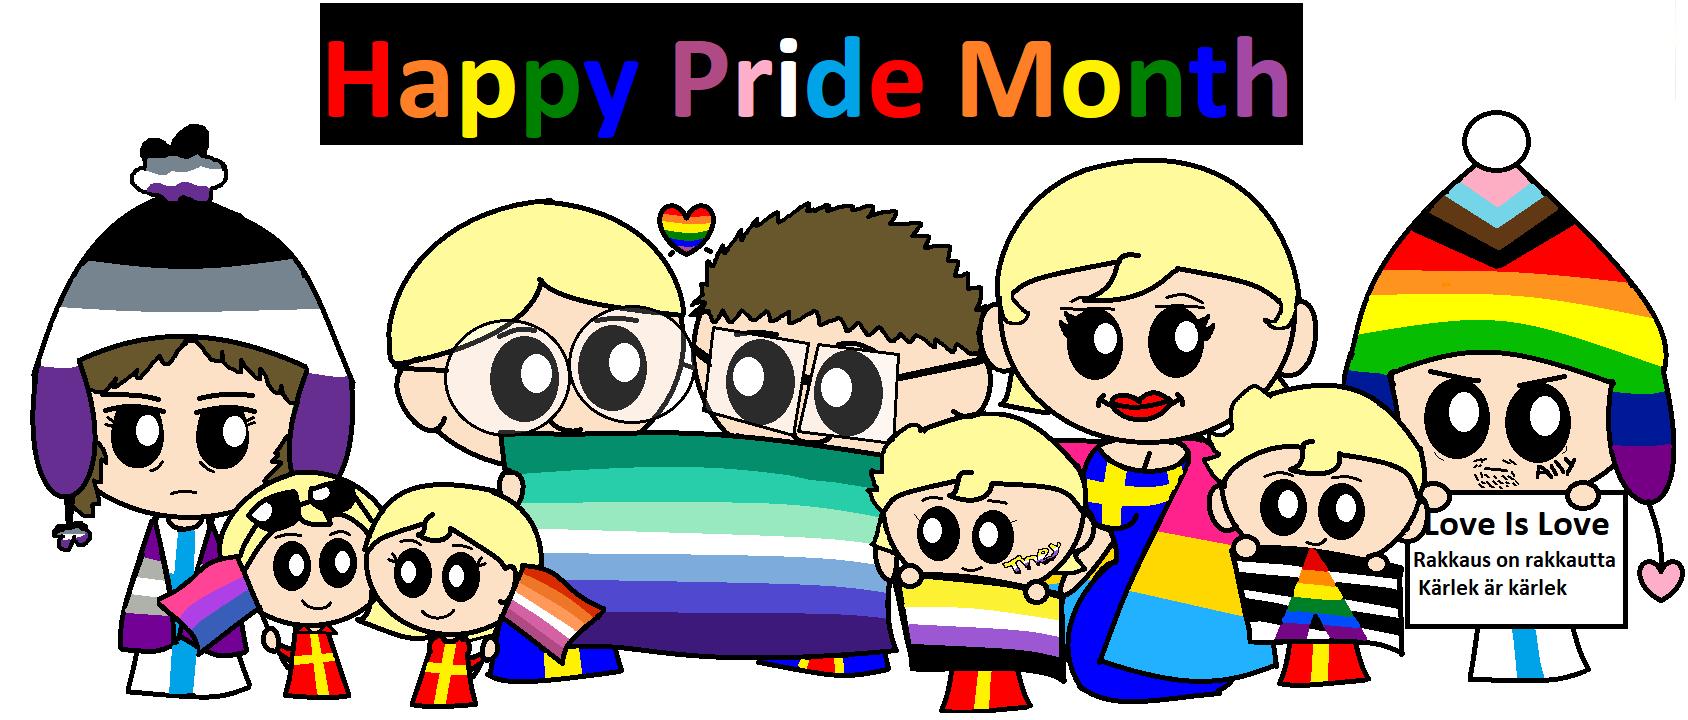 Happy Pride Month satwcomic.com